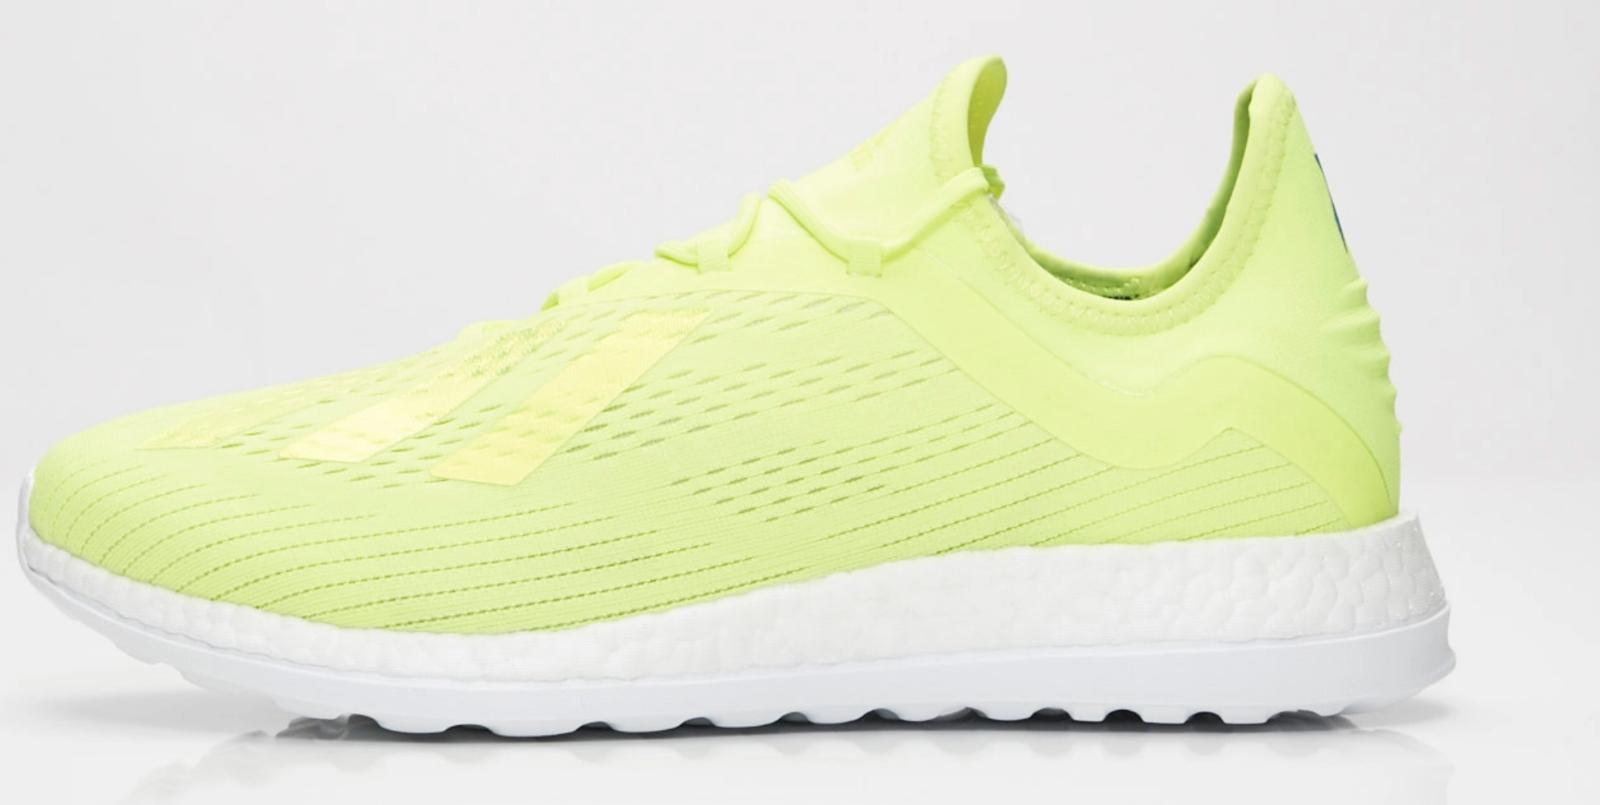 Nouveau Adidas World Cup X 18+ TR BB7421 Football Solar jaune Ice chaussures jaunes n1